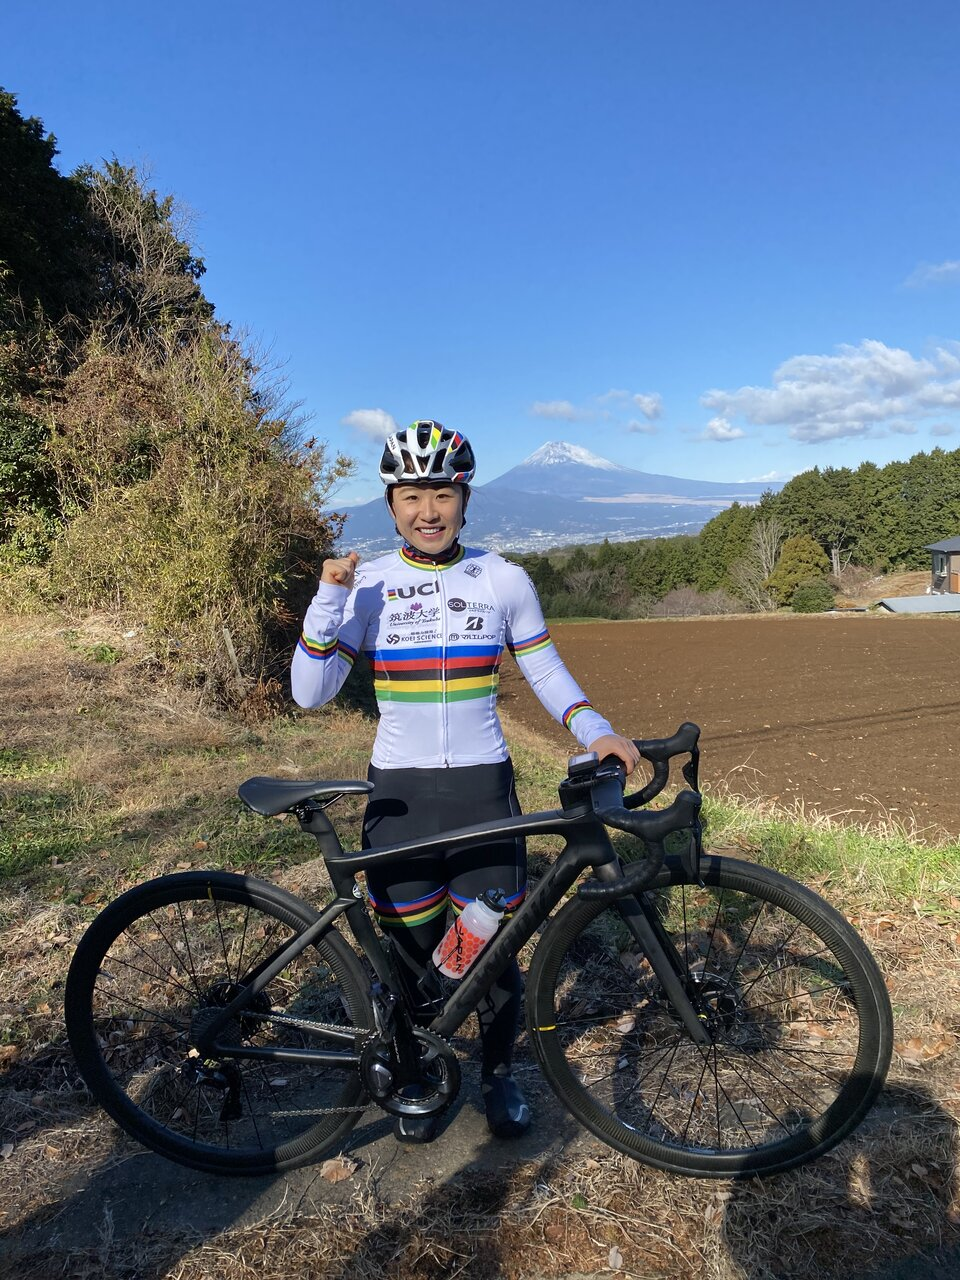 "<a href=""https://www.yumi-kajihara.com"" class=""default-link"" target=""_blank"" rel=""nofollow"">梶原悠未選手</a>2020年に自転車世界選手権大会オムニアムで日本人史上初の金メダルを獲得。トレーナー兼マネージャーのお母さんと東京オリンピックの頂点を目指します。<br> 写真:梶原有里さん提供"